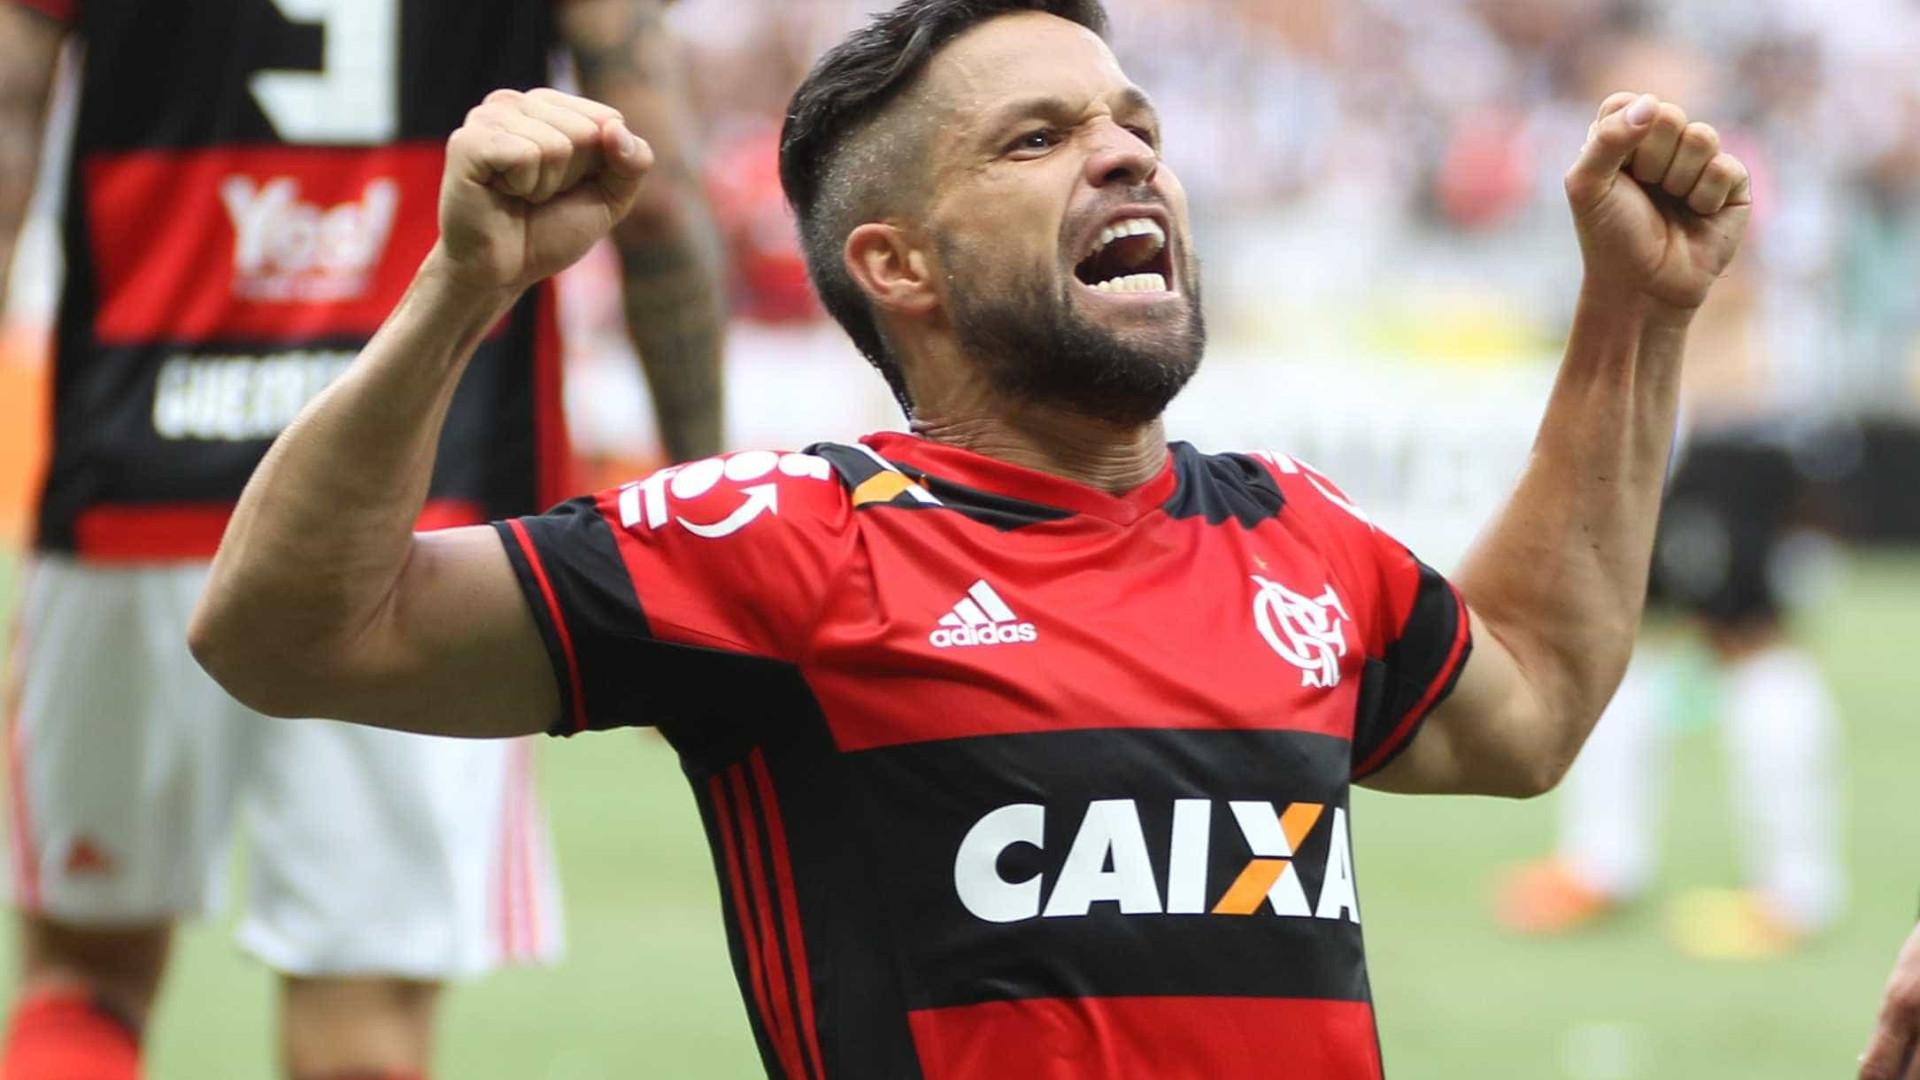 Flamengo fecha patrocínio de R$ 200 milhões com marca tailandesa